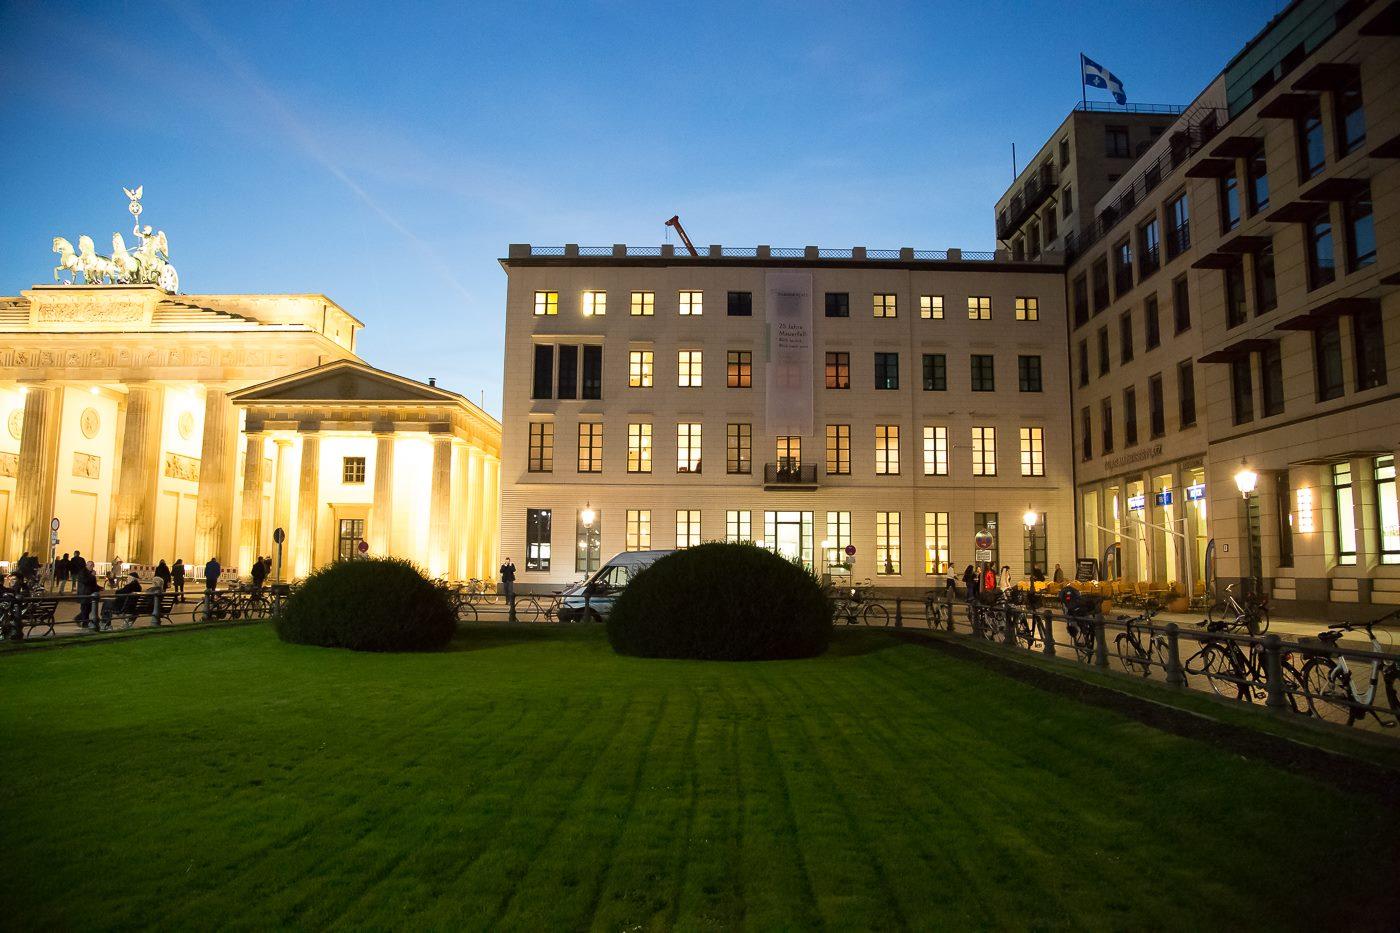 Stiftung Brandenburger Tor Wikipedia